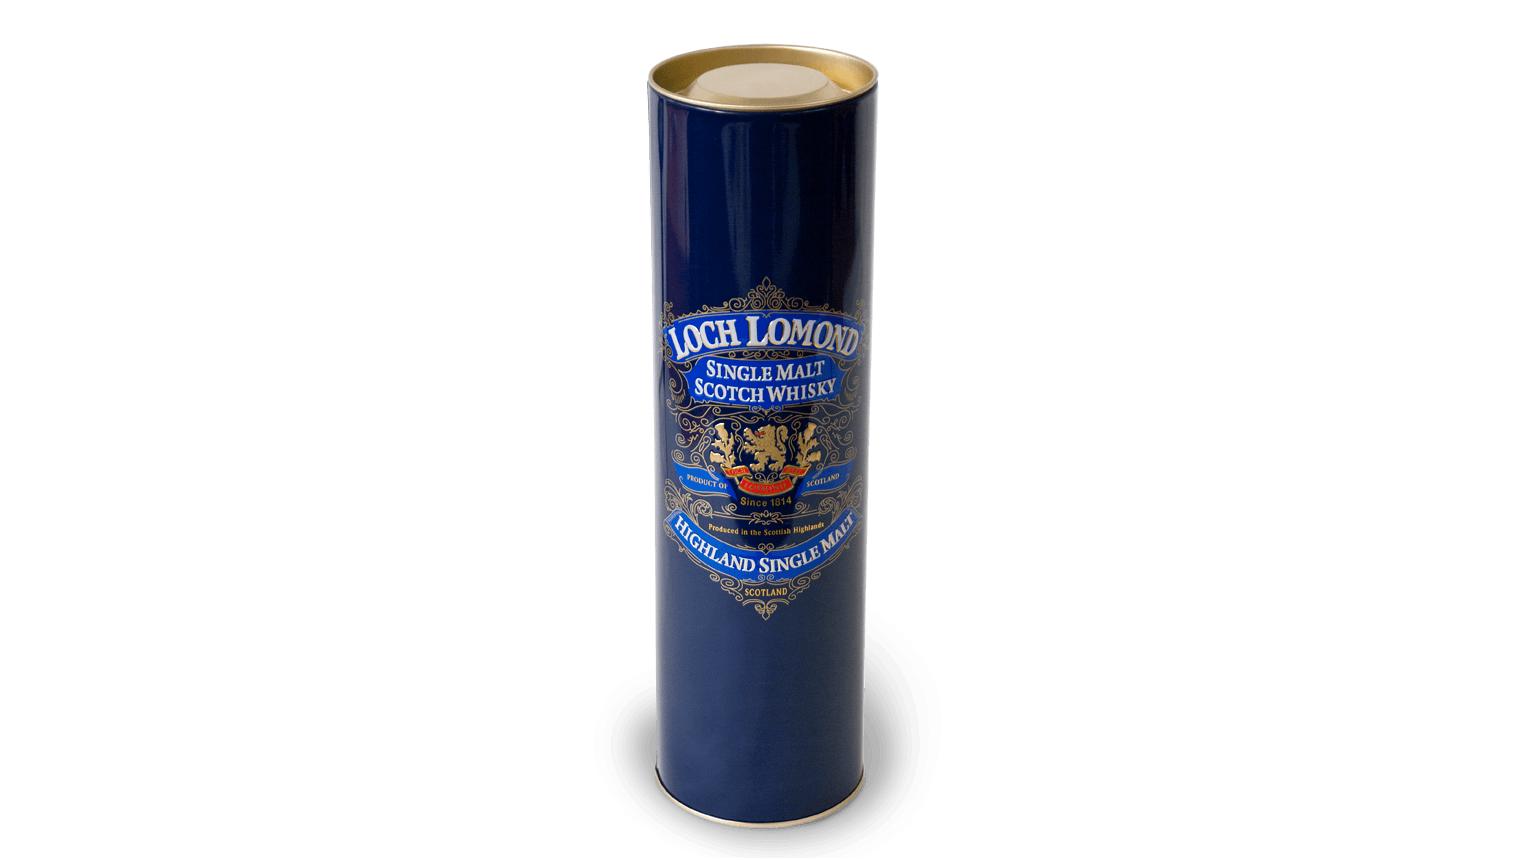 Loch Lomond Flaschen Blechdose